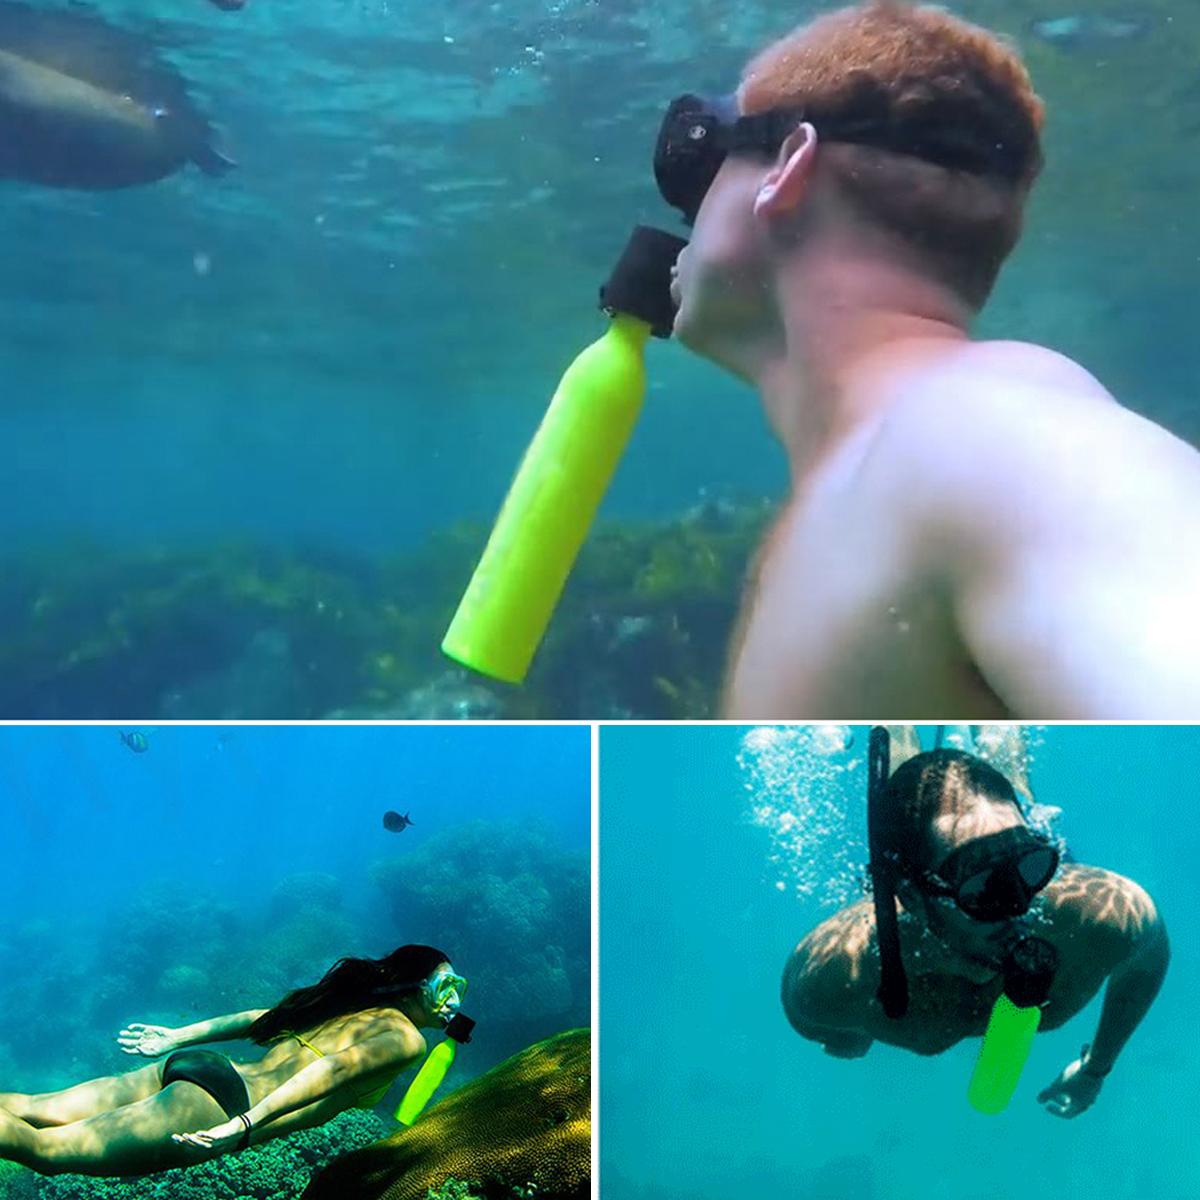 7pcs Mini Scuba Diving Tank Portable Spare Air Freedom Breath Underwater Set 5-10Min